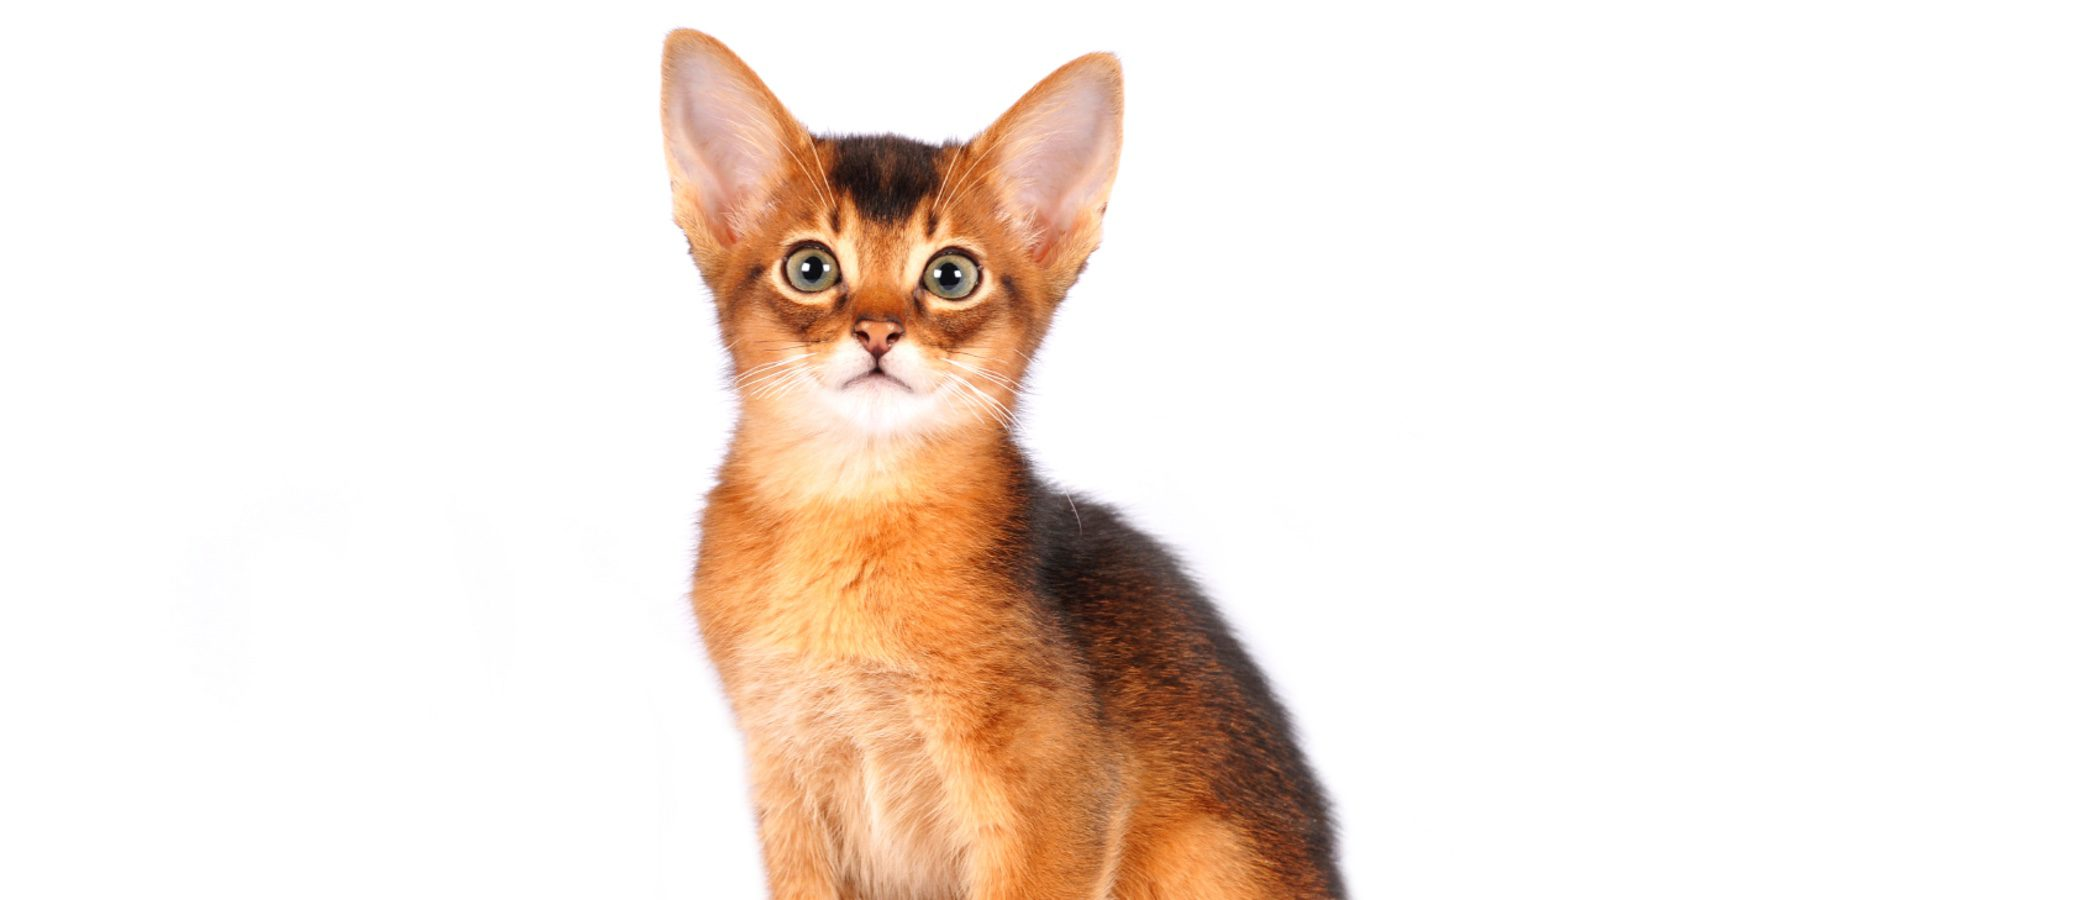 Gato Abisinio: todo sobre esta raza de felino